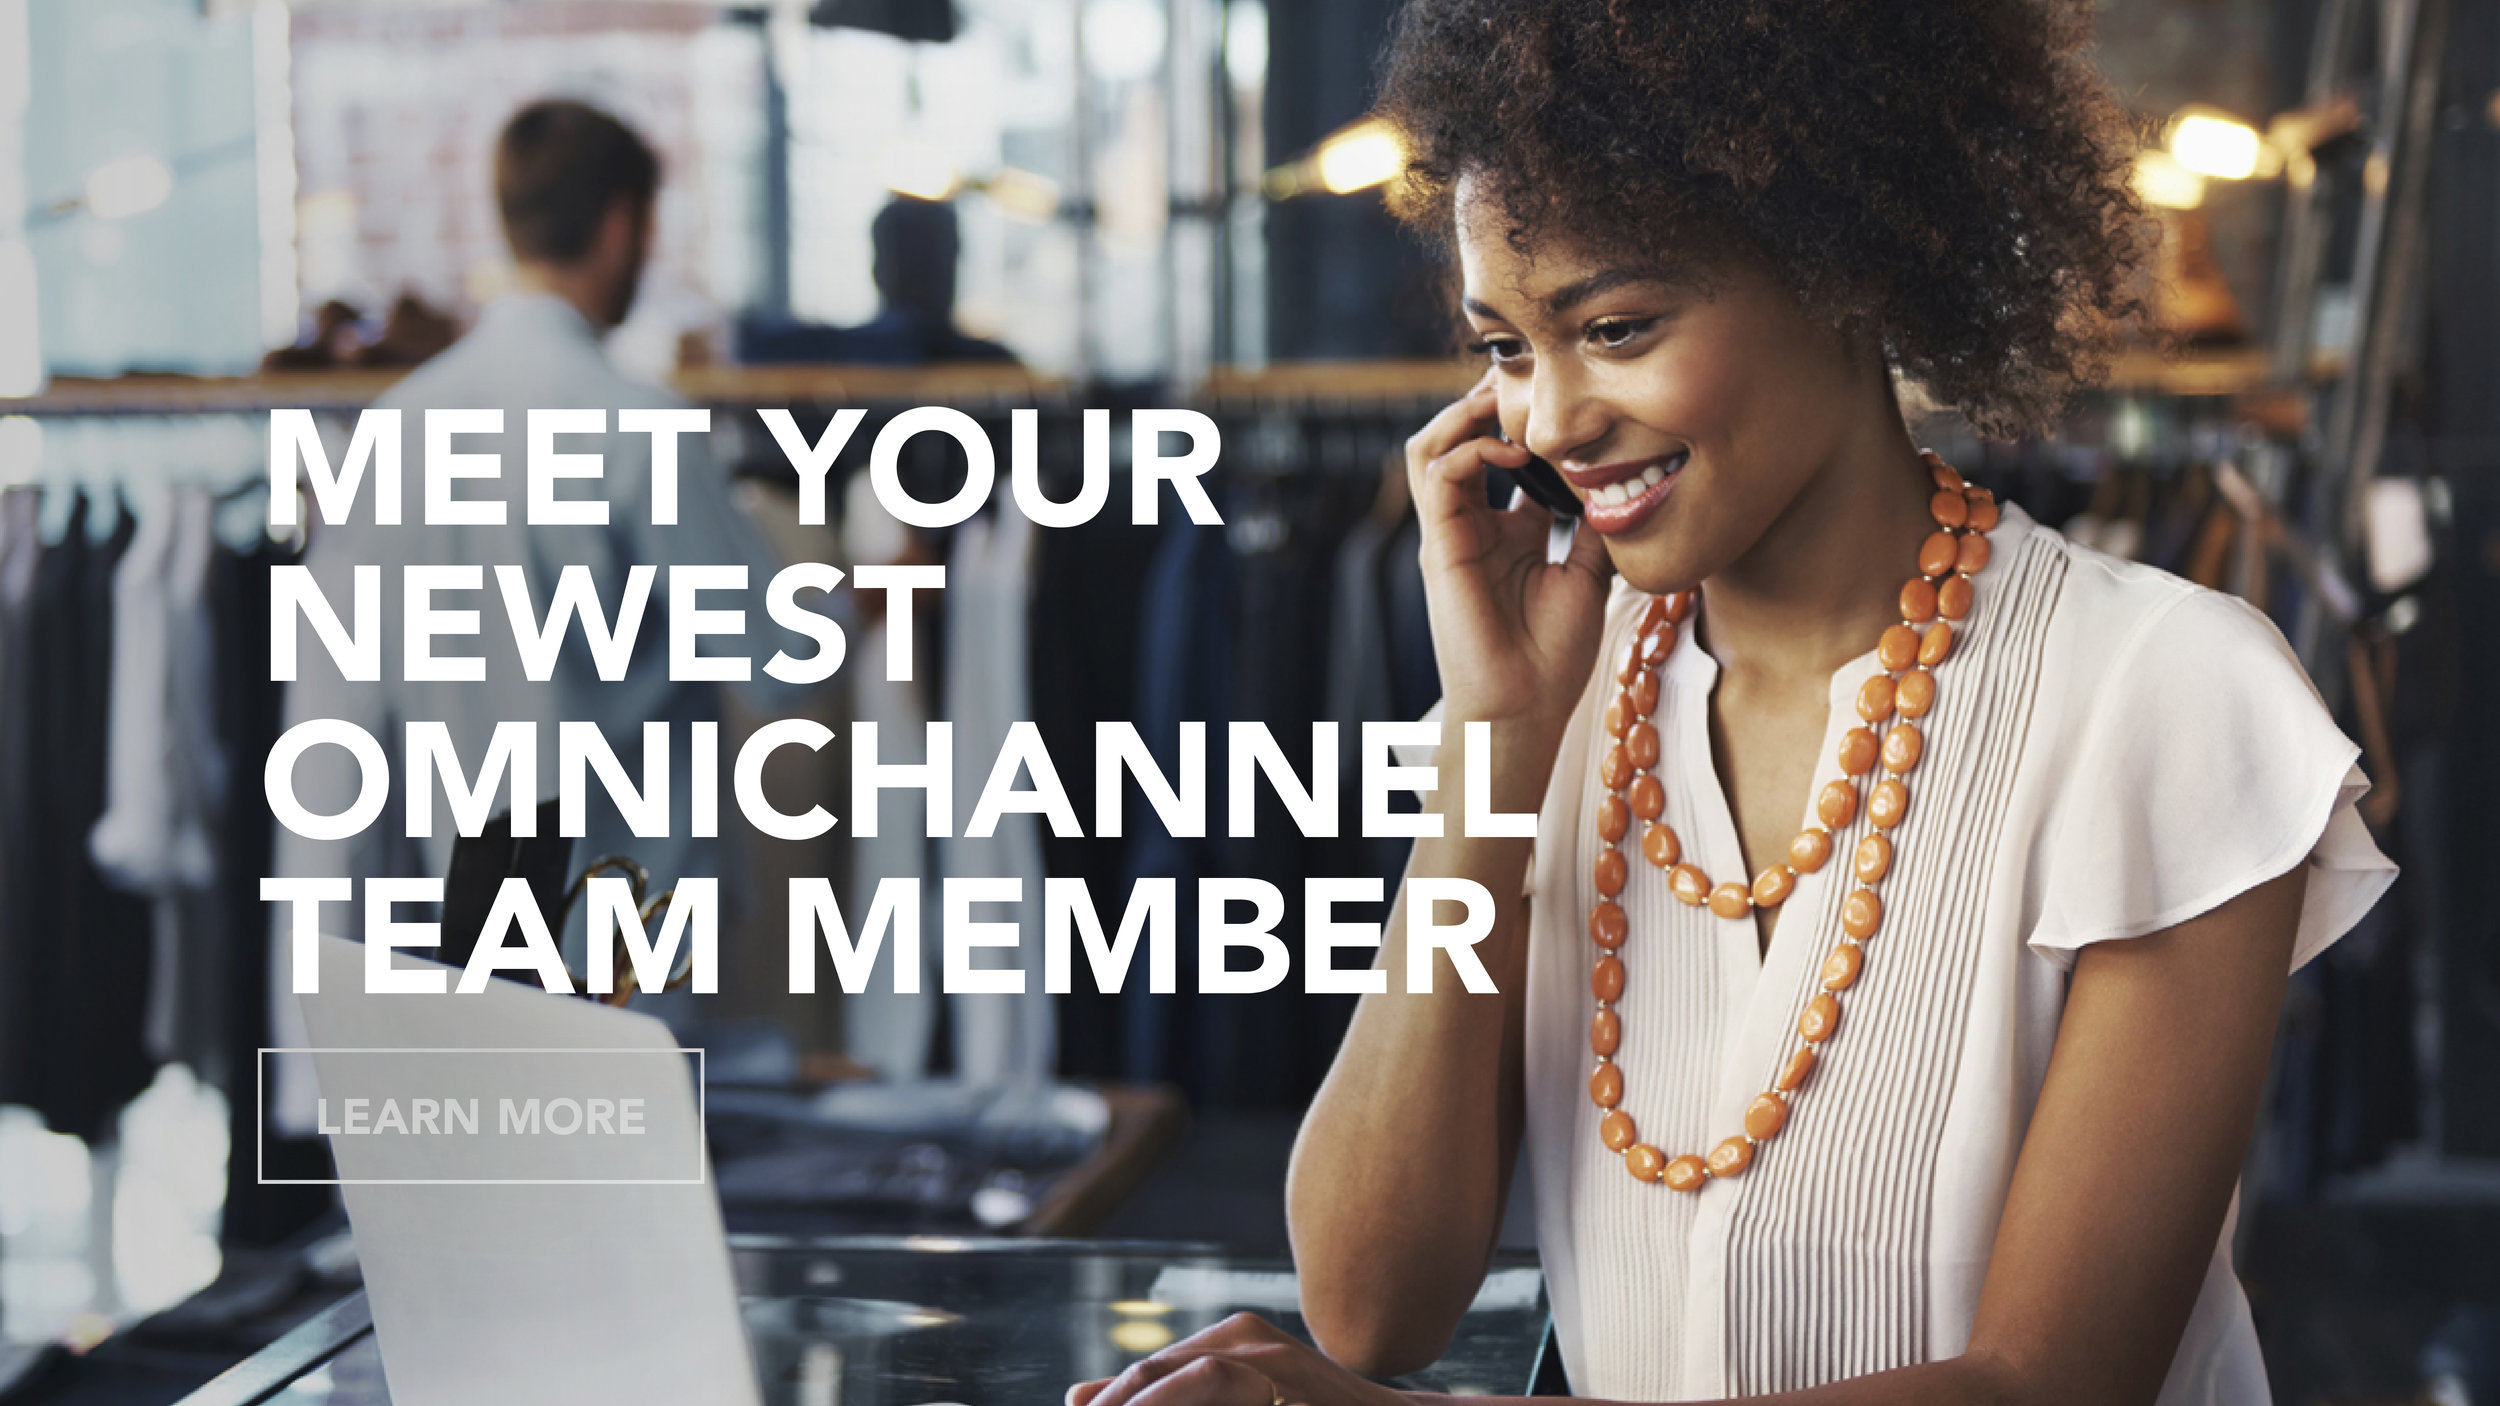 Meet Your Newest Omnichannel Team Member.jpg